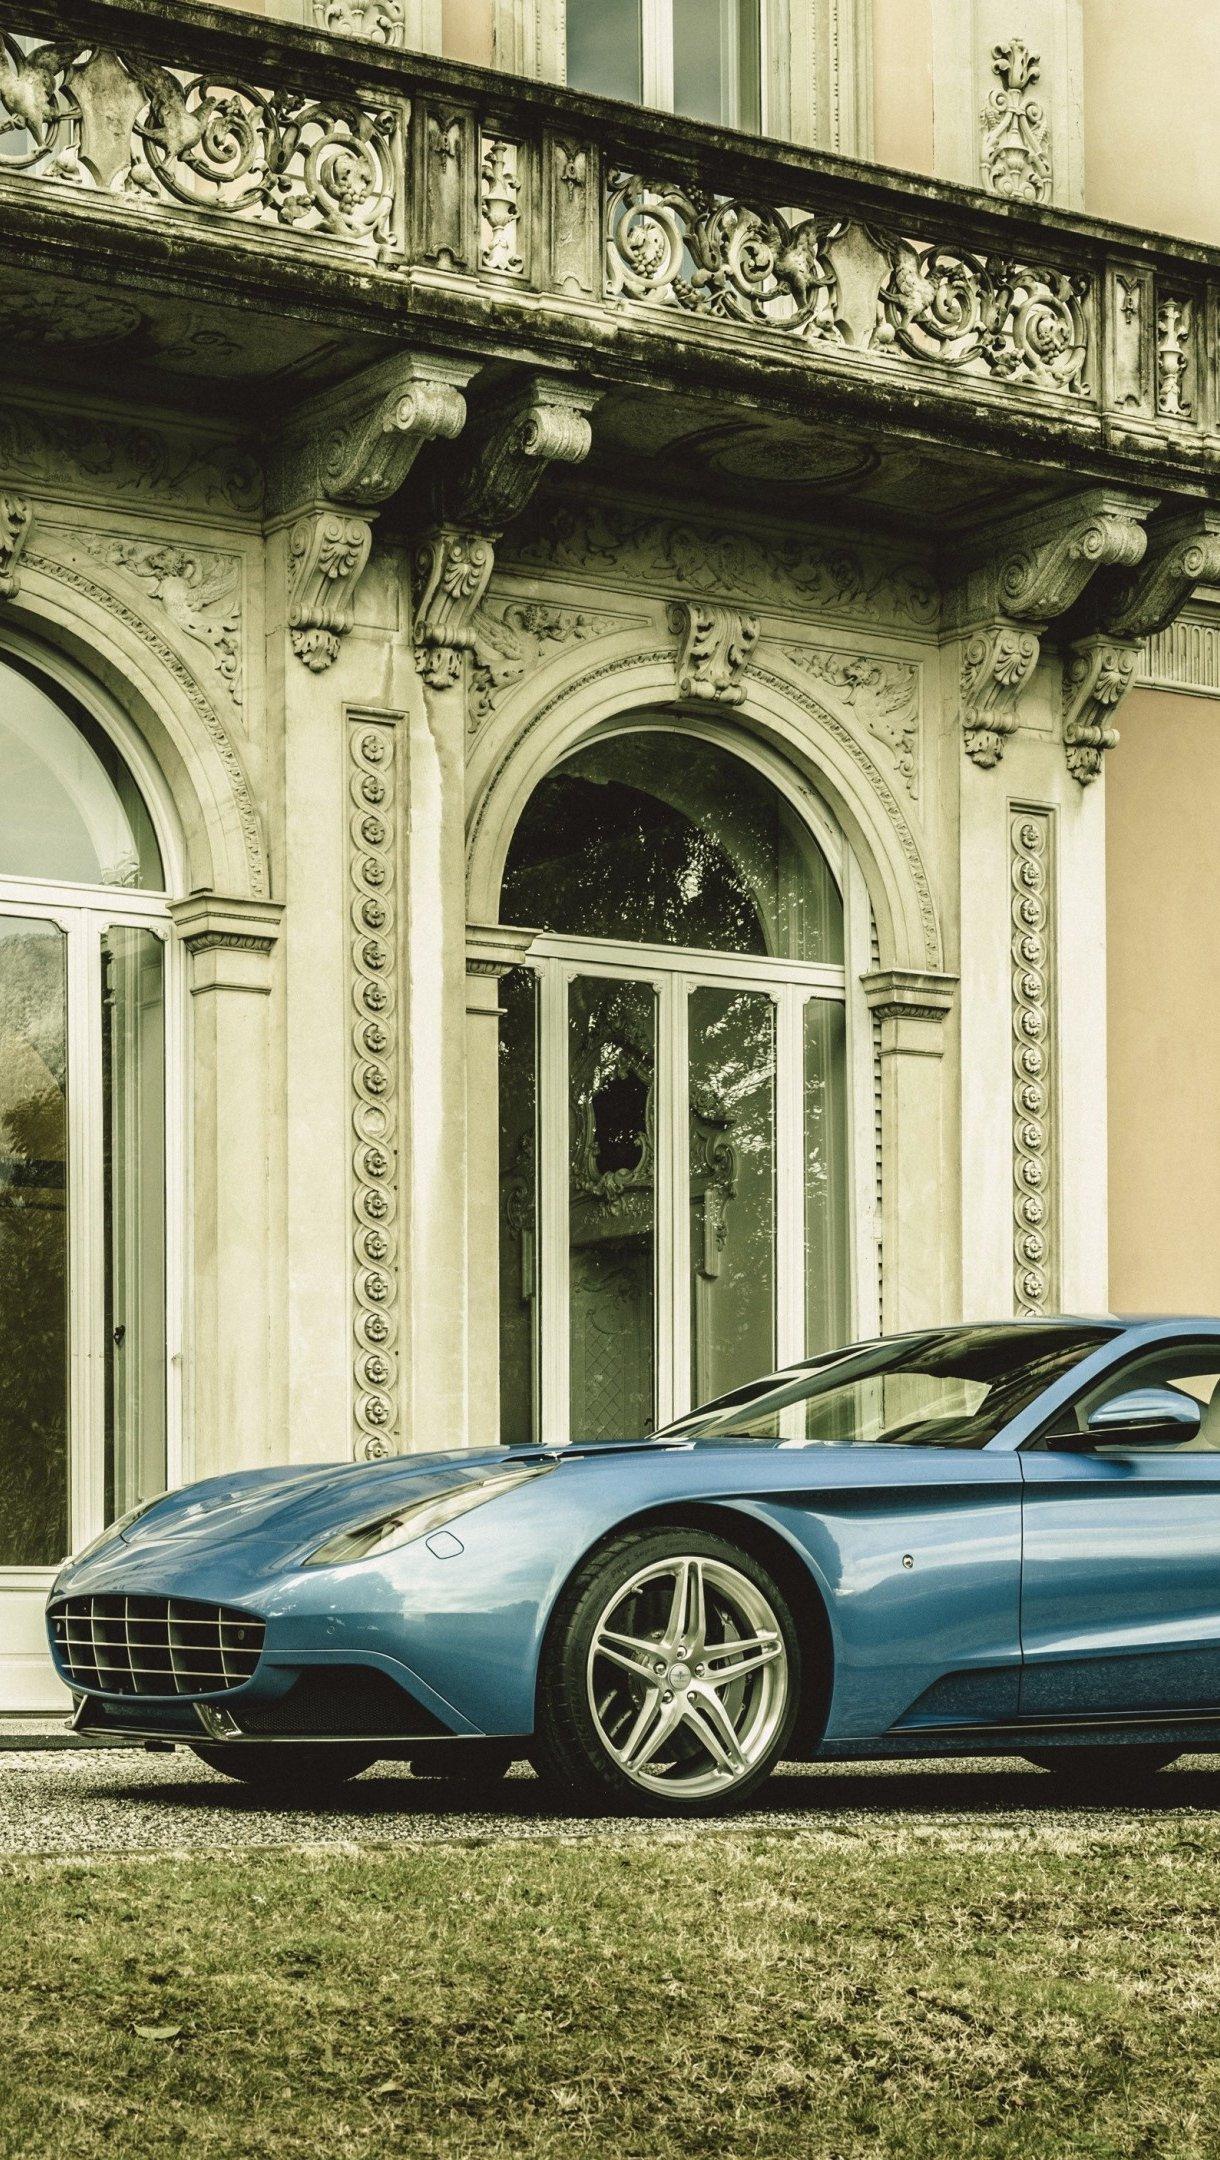 Wallpaper Ferrari 2015 Carrozzeria Touring Berlinertta Vertical